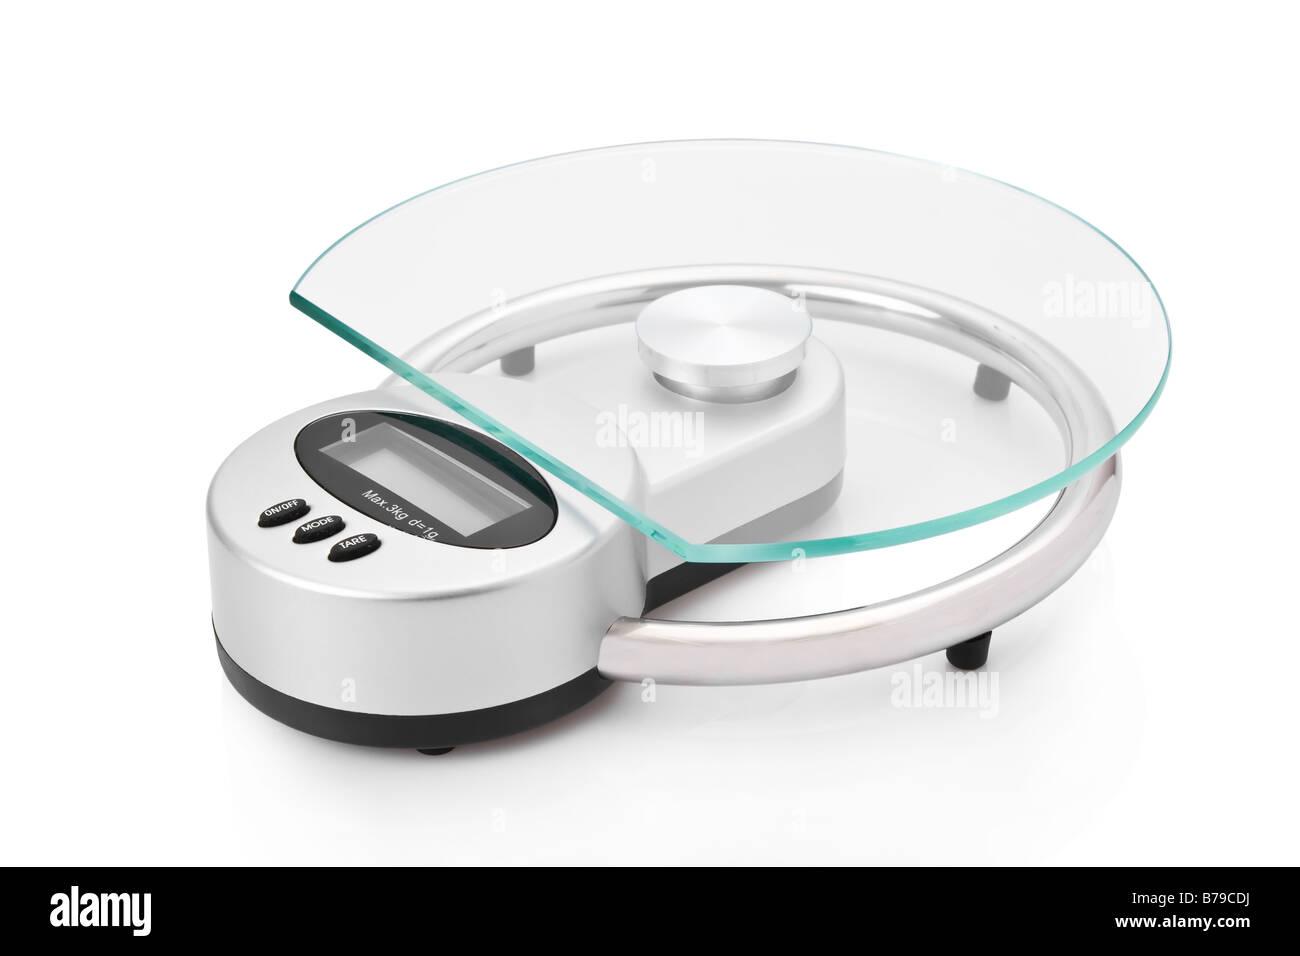 Modern digital kitchen scale isolated on white background - Stock Image